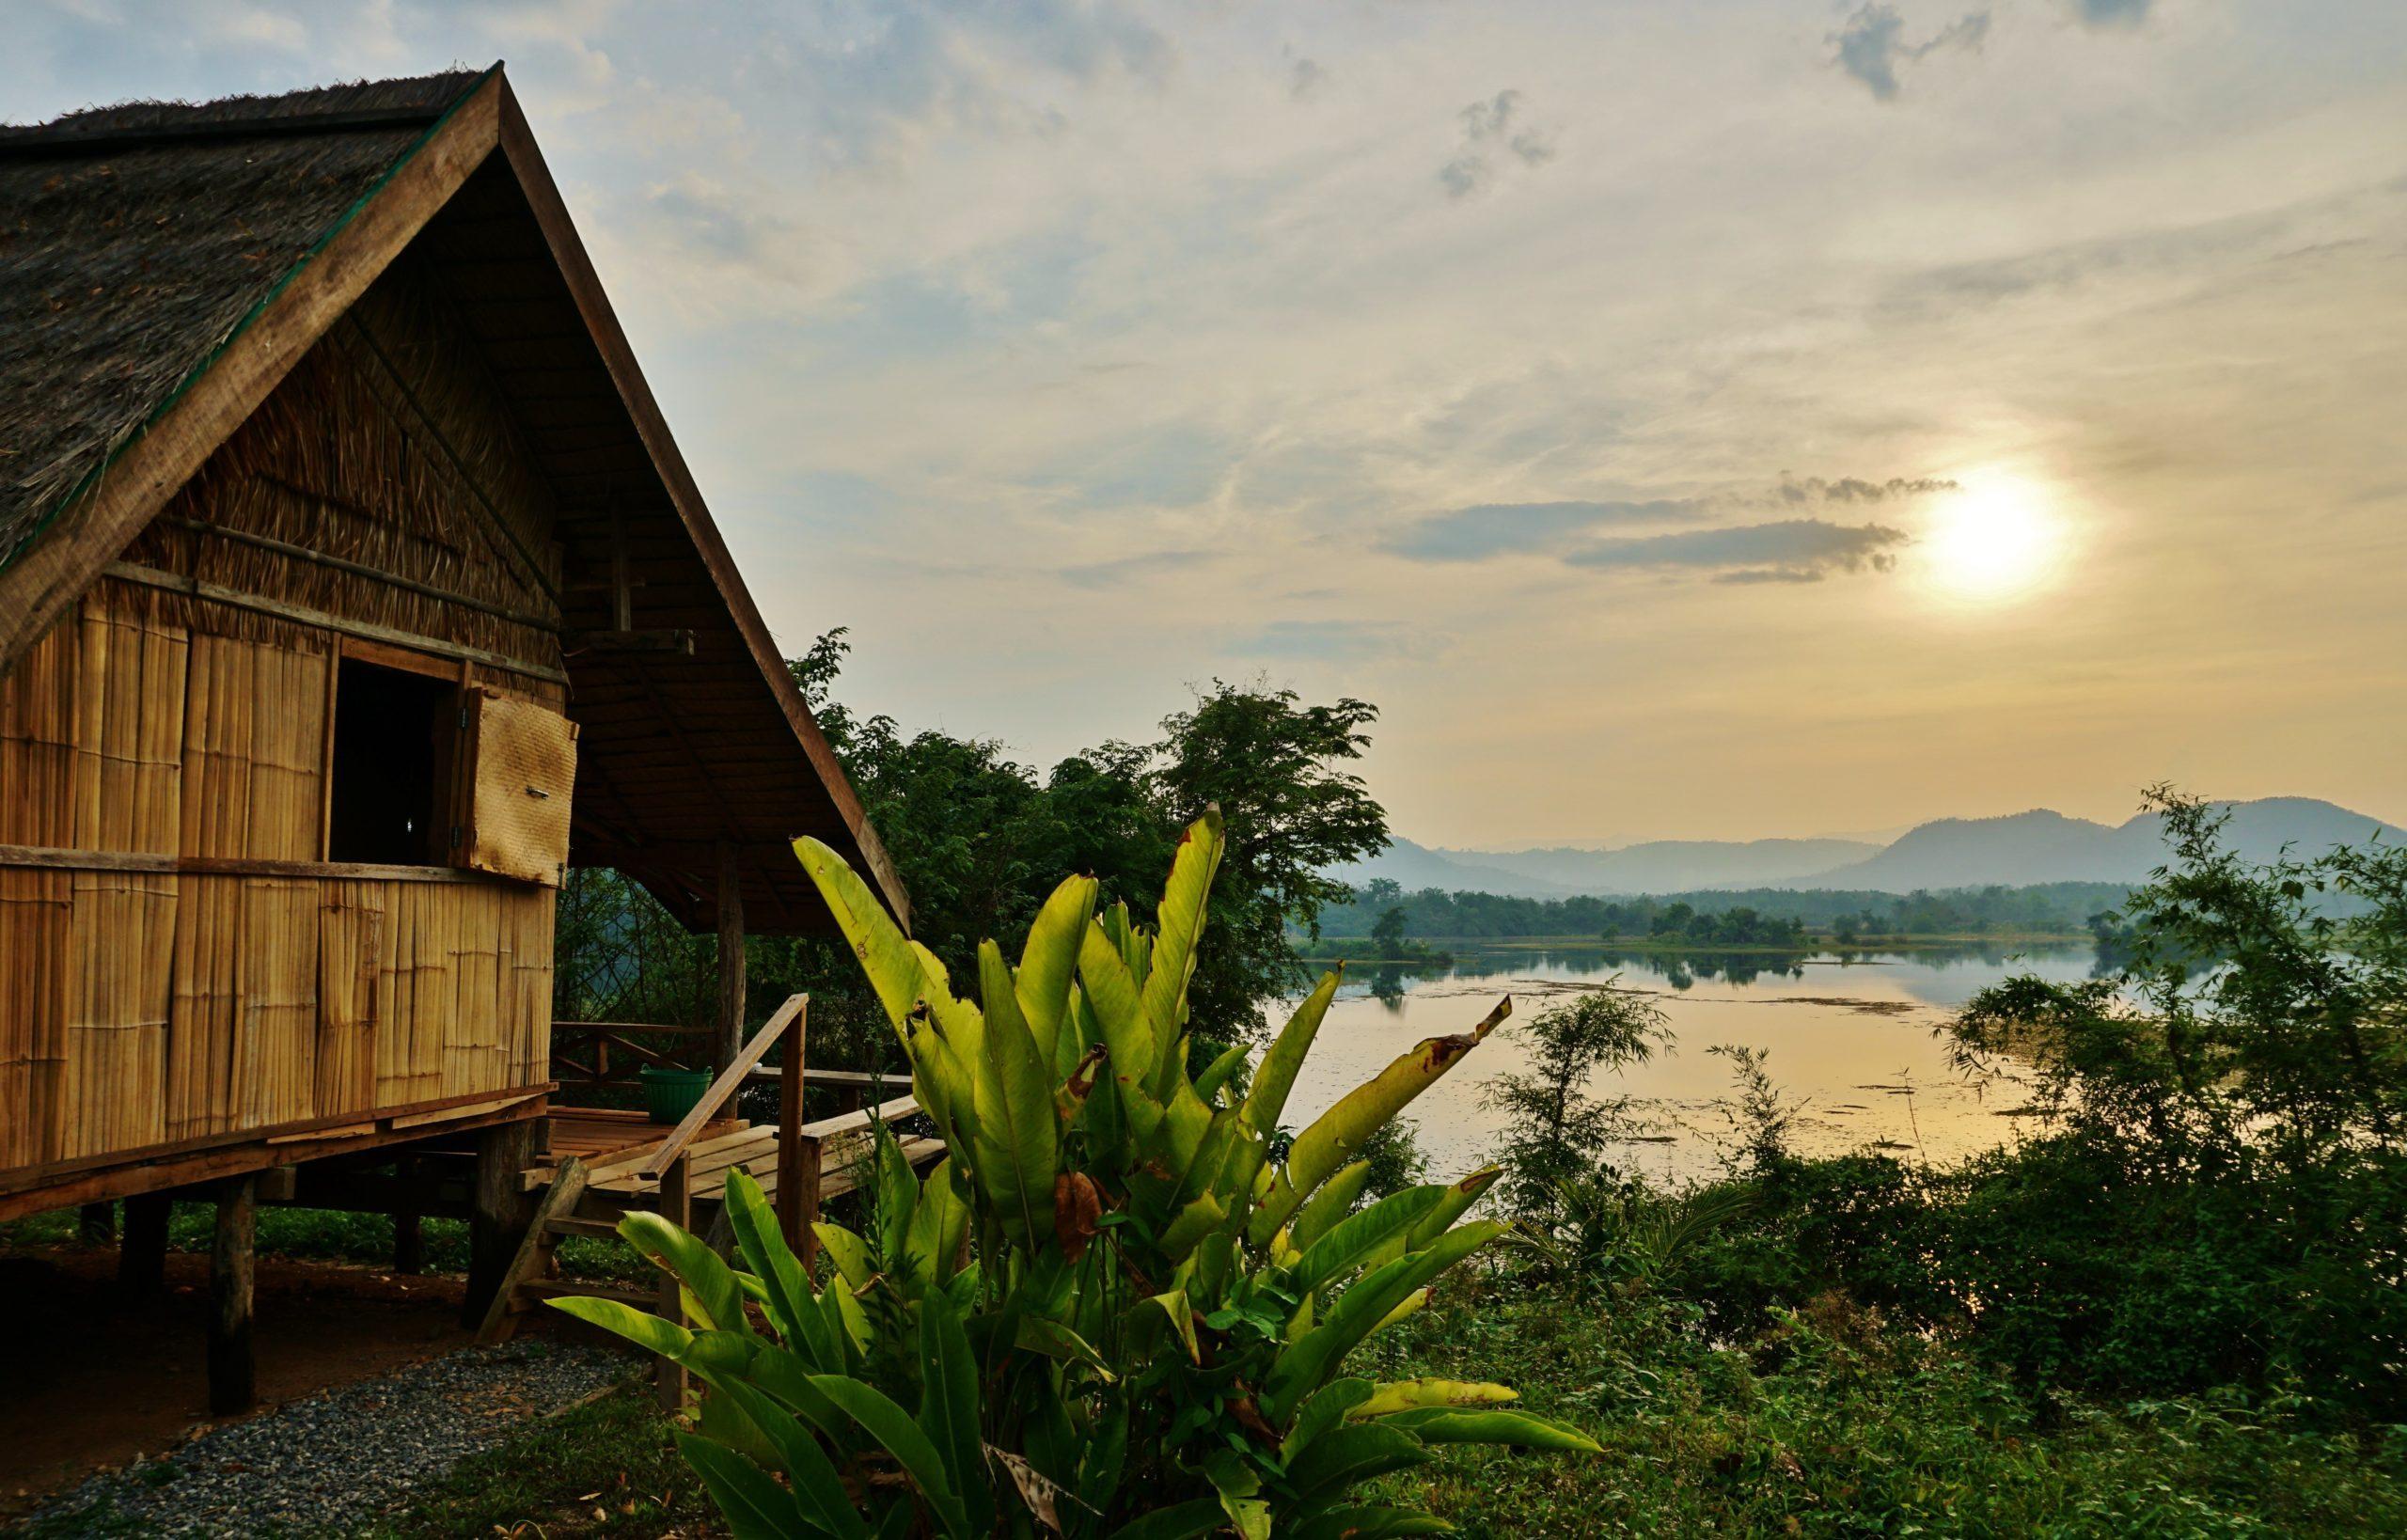 Motorrad-Roadtrip Thailand & Laos - Jenseits des Mekong